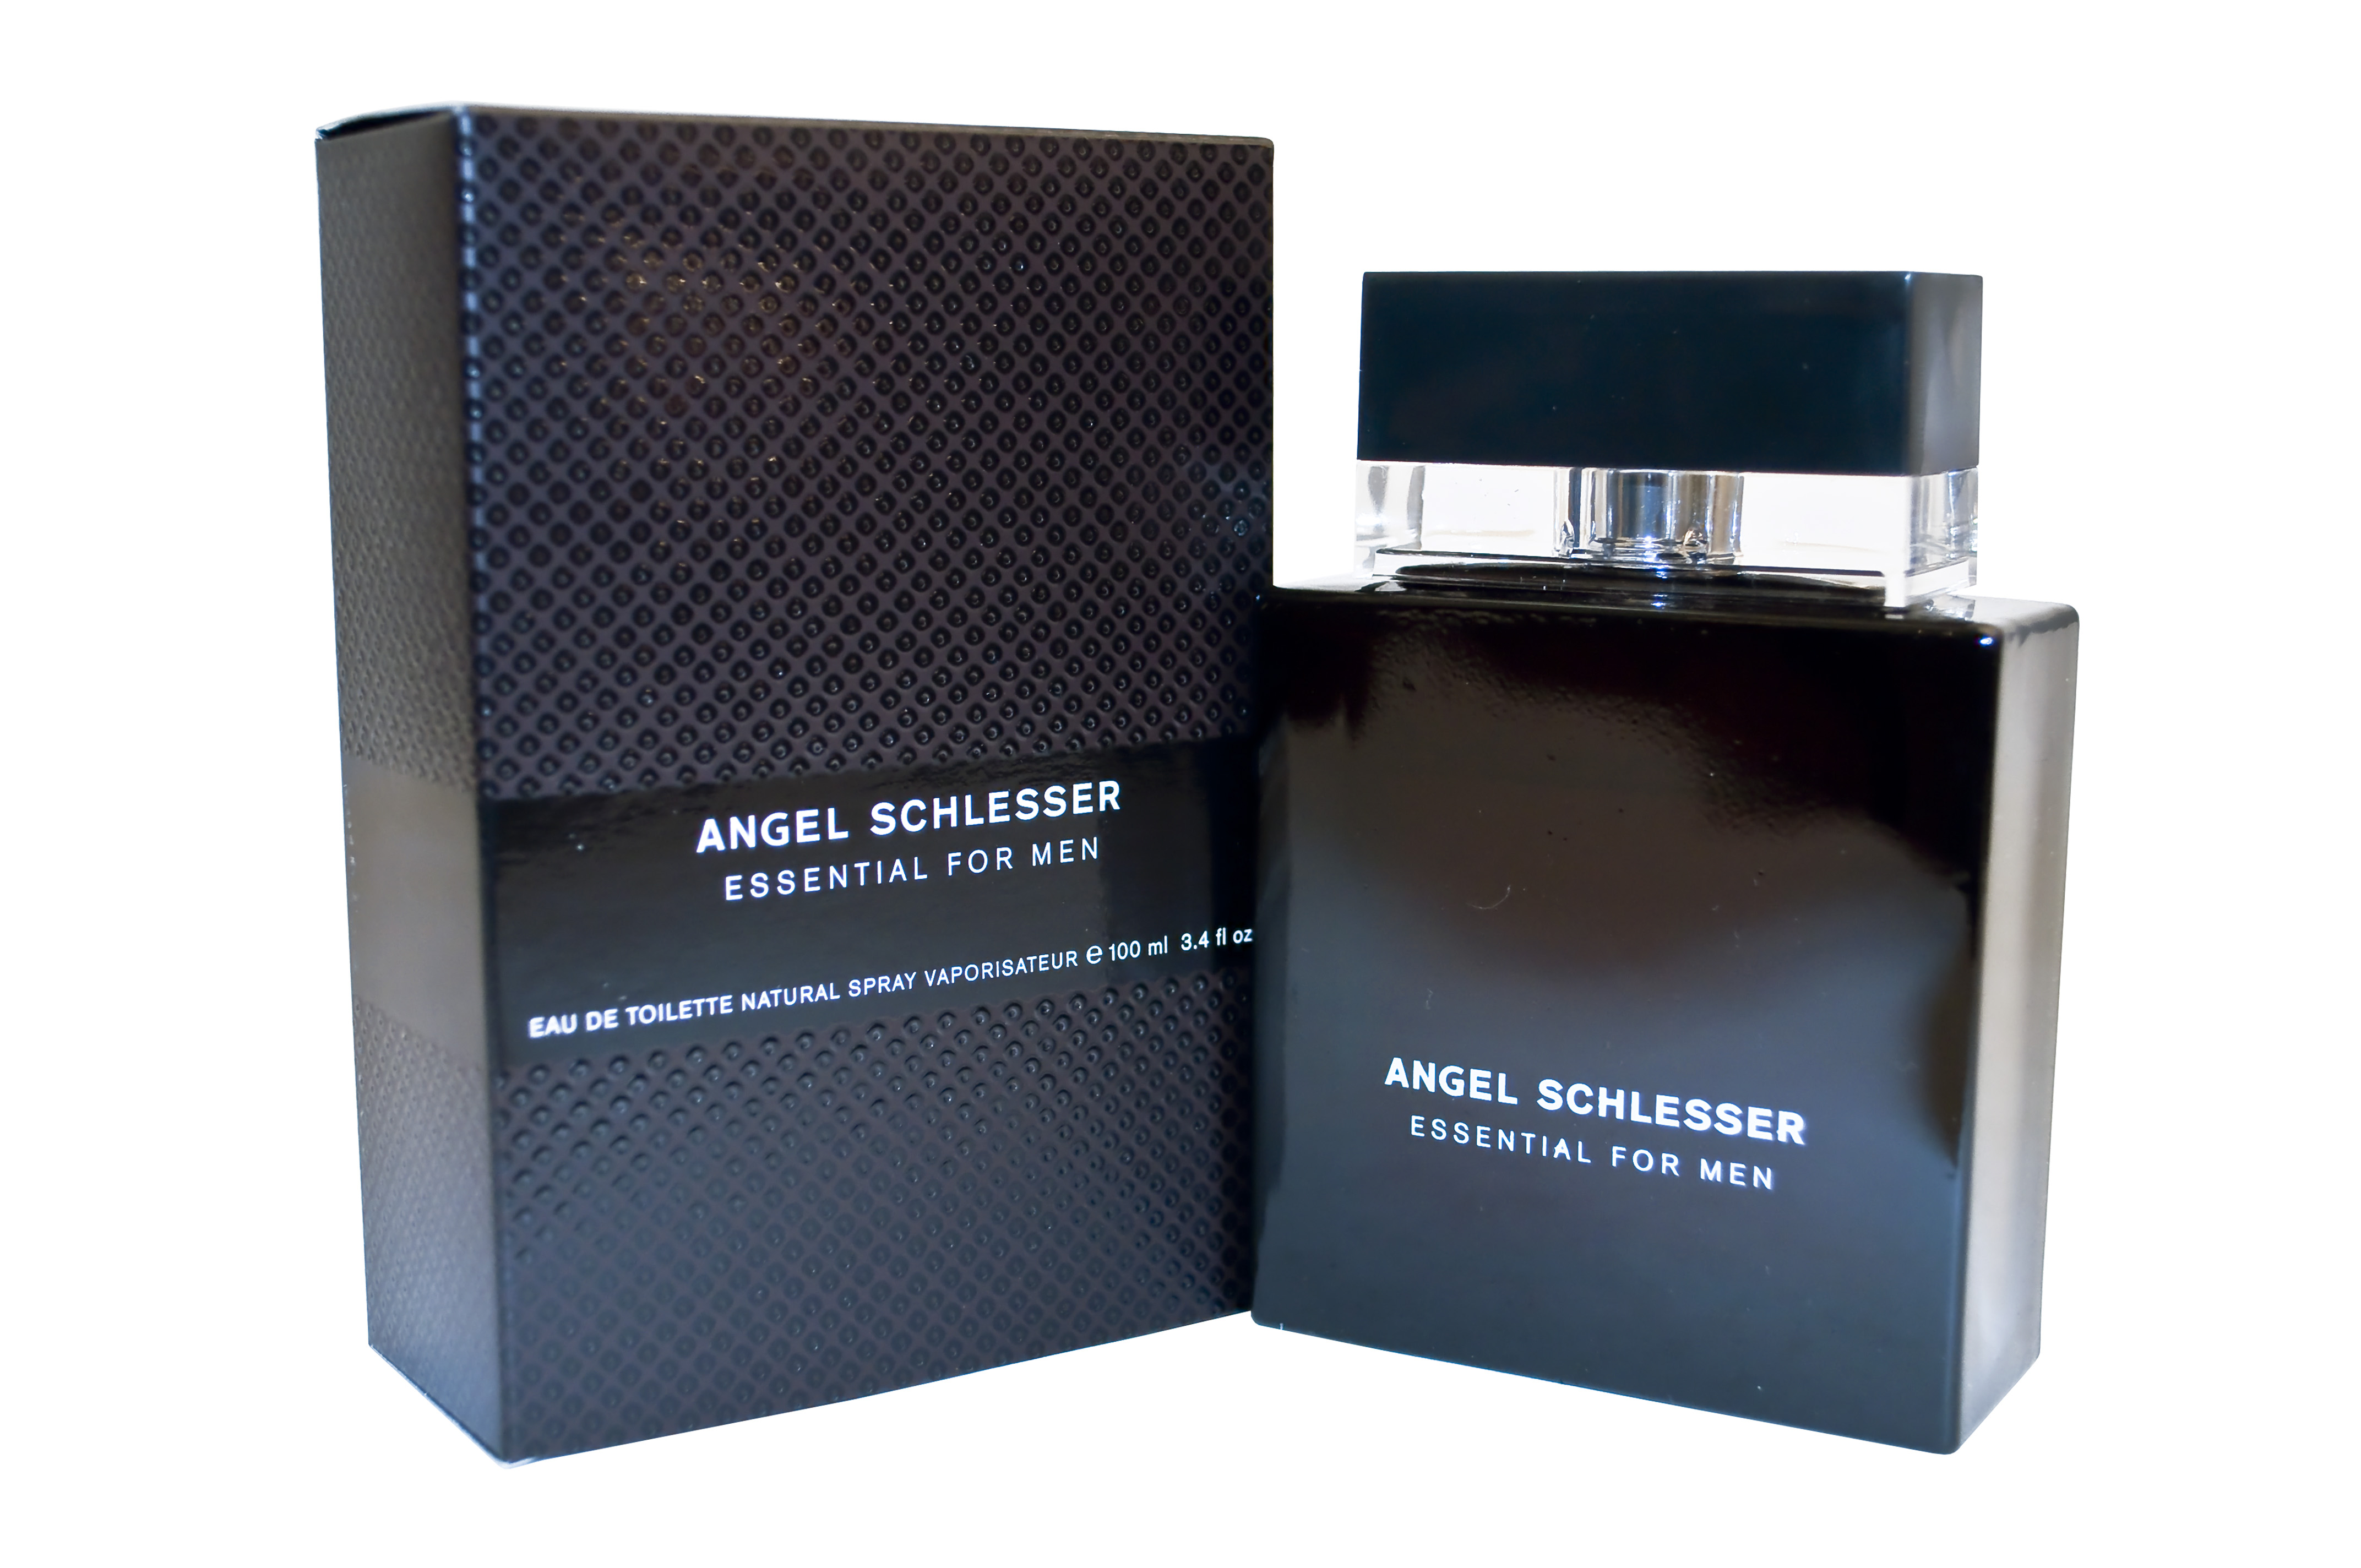 Angel Schlesser Essential For Men Eau de Toilette 100ml